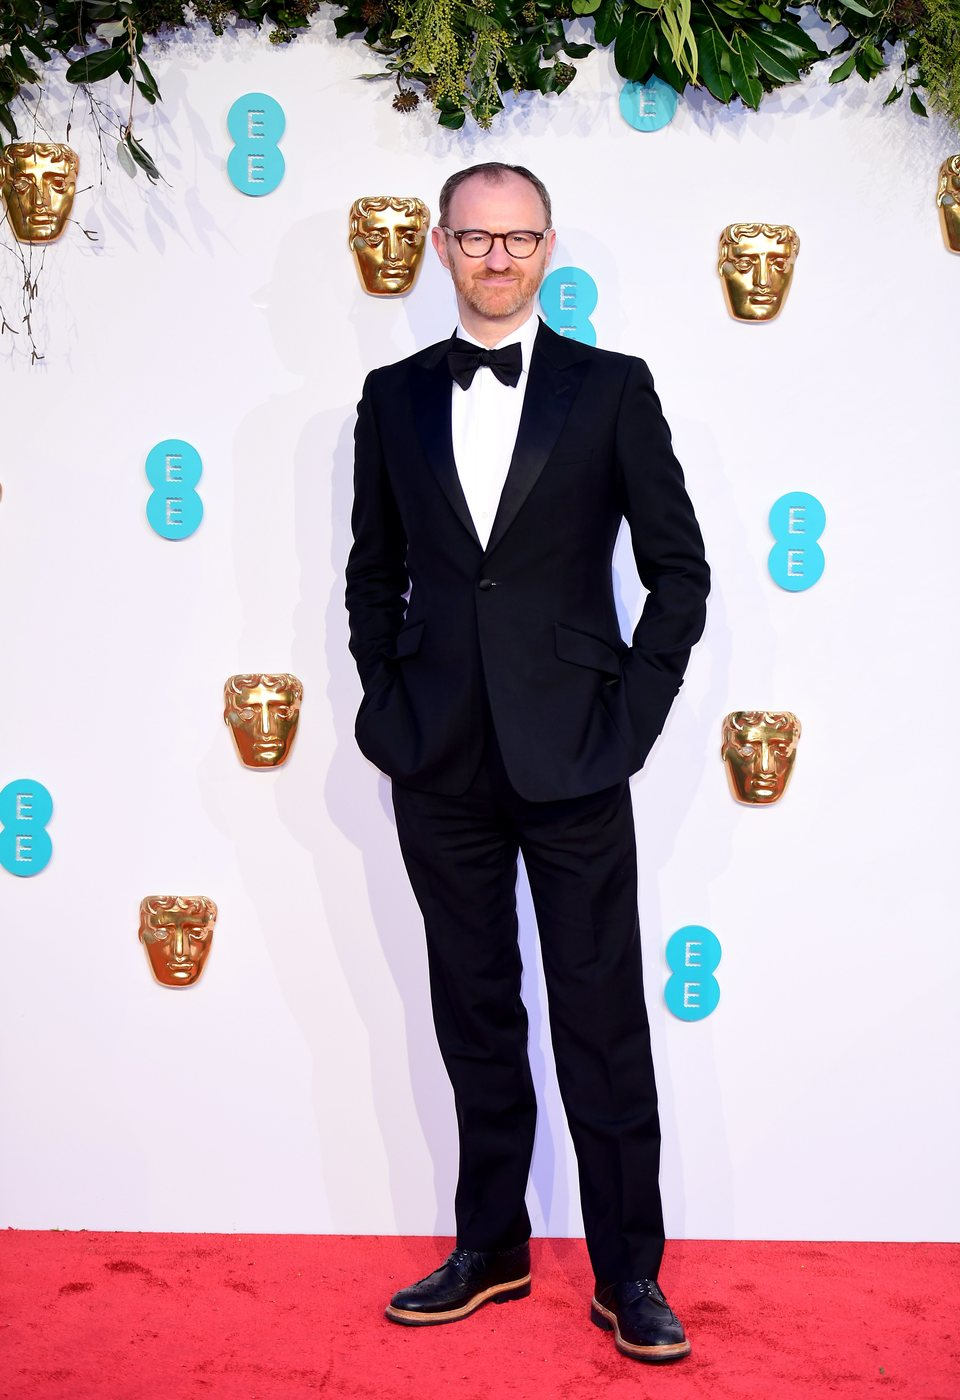 Mark Gatiss at the BAFTAs 2019 Red Carpet